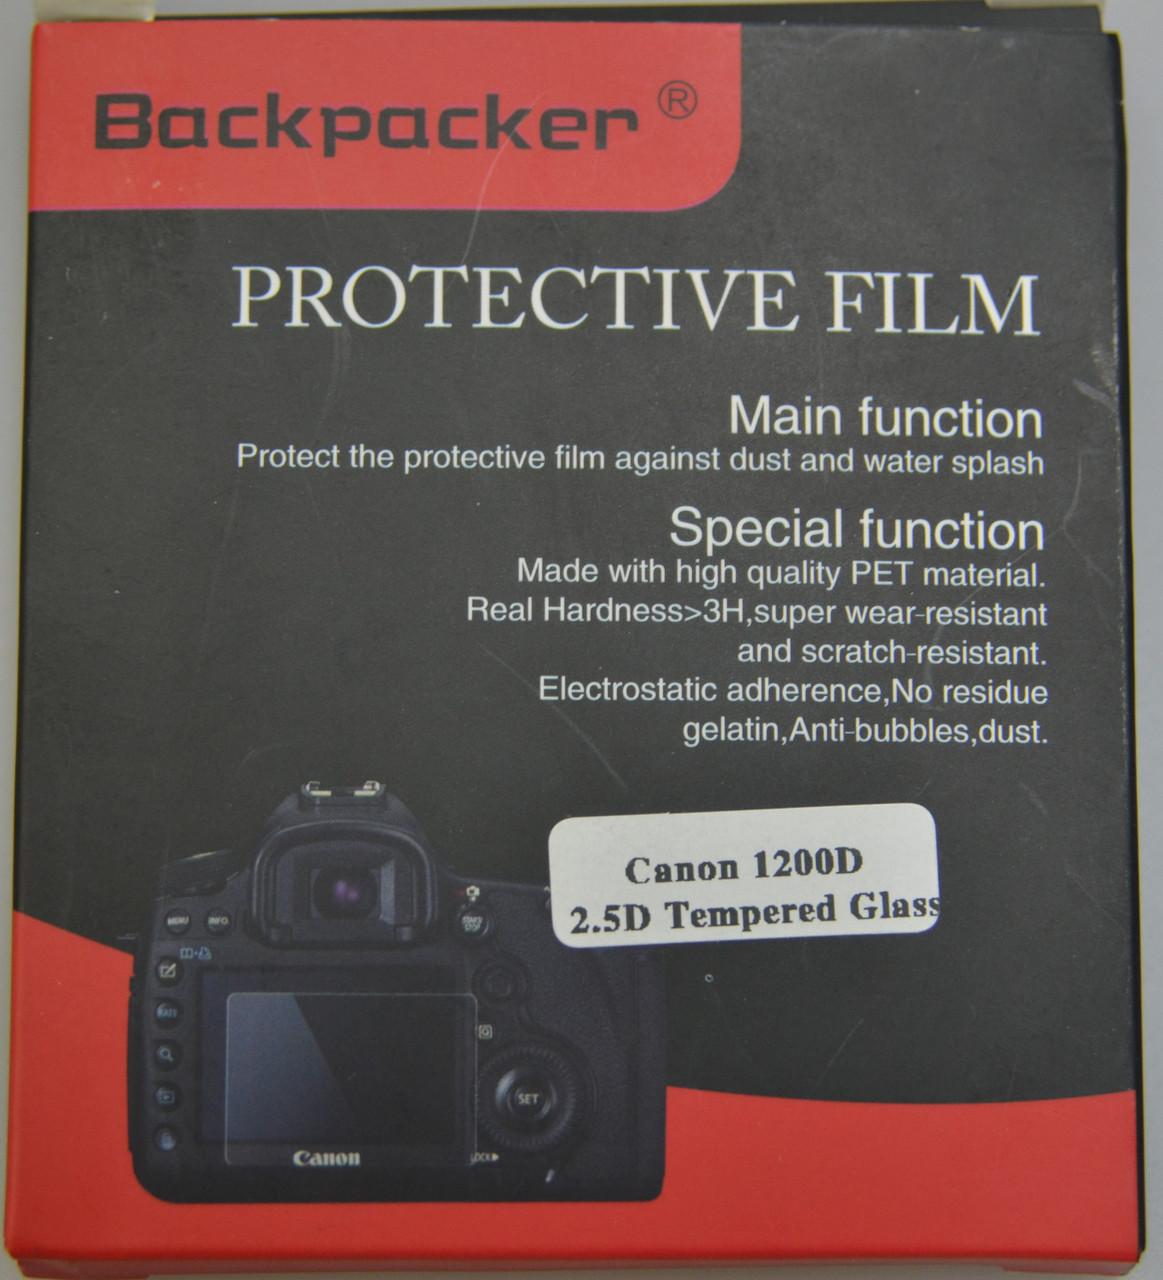 Защитное стекло на экран Canon 1300D (1200D) Backpacker tempered glass ( на  складе ): продажа, цена в Харькове  защитные пленки и стекла для